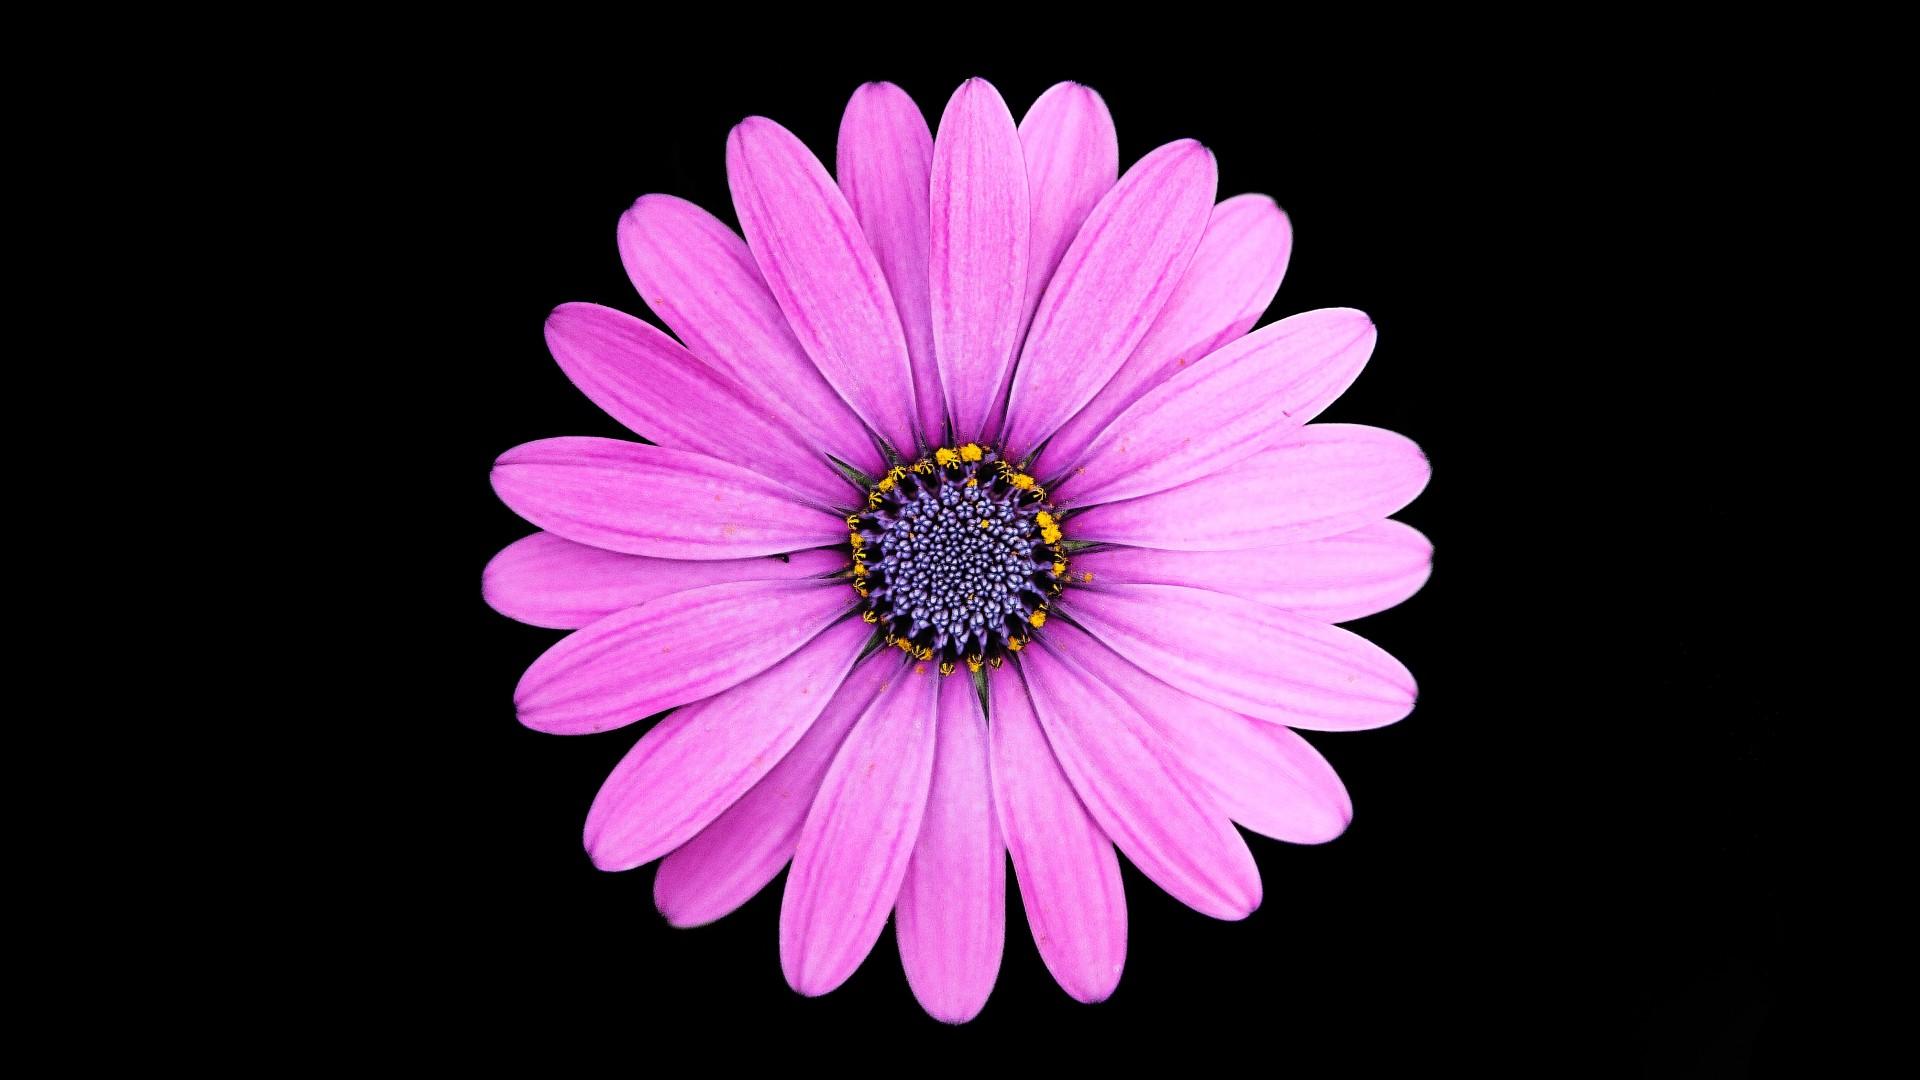 Wallpaper For Iphone 5s Black Margarita Purple Daisy Flower 4k Wallpapers Hd